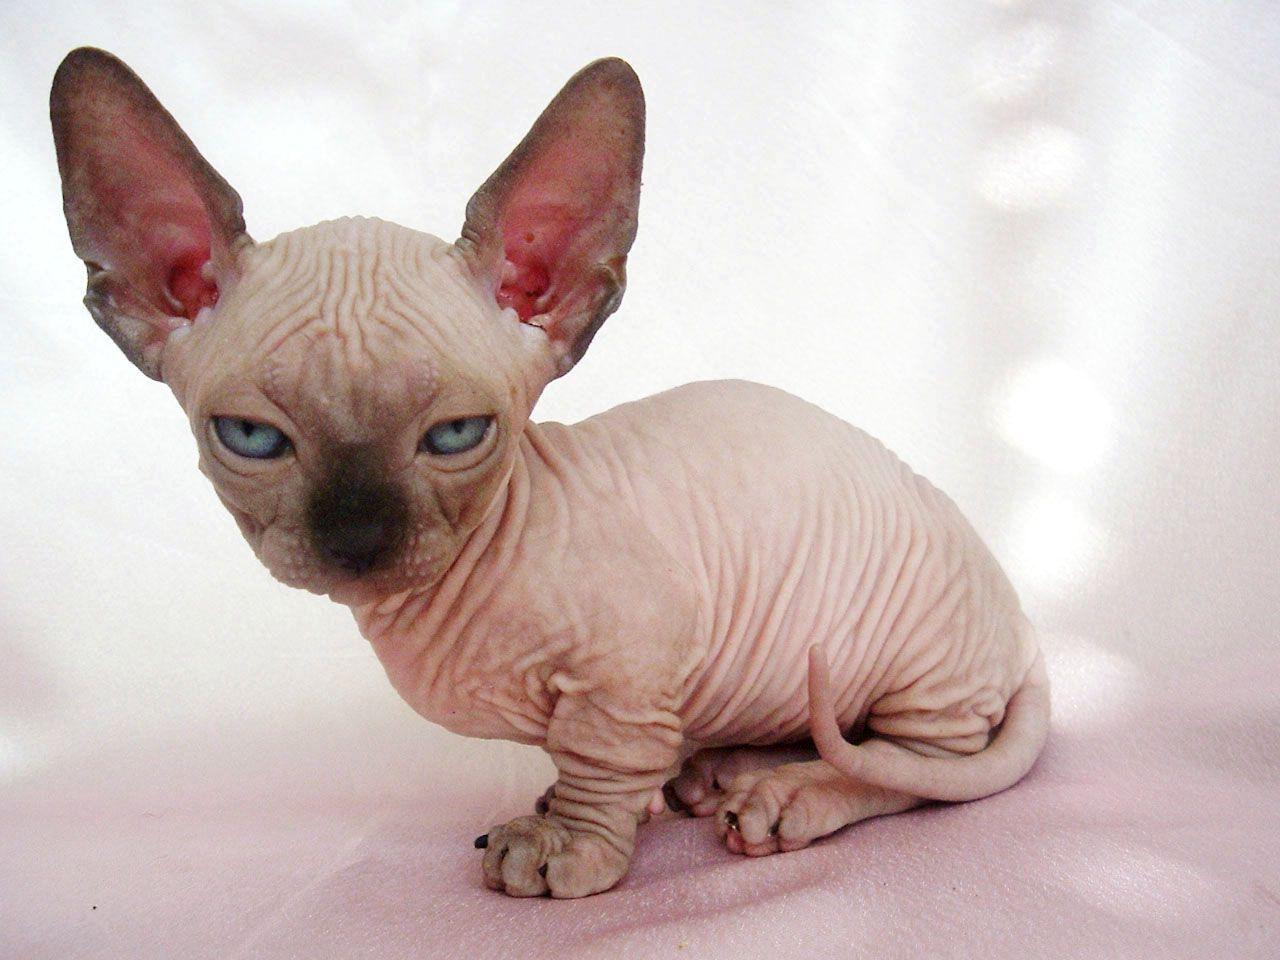 Sphynx Cat Kittens Wallpaper 3 Jpg 1 280 960 Pixels Baby Hairless Cat Cat Allergies Fluffy Cat Breeds